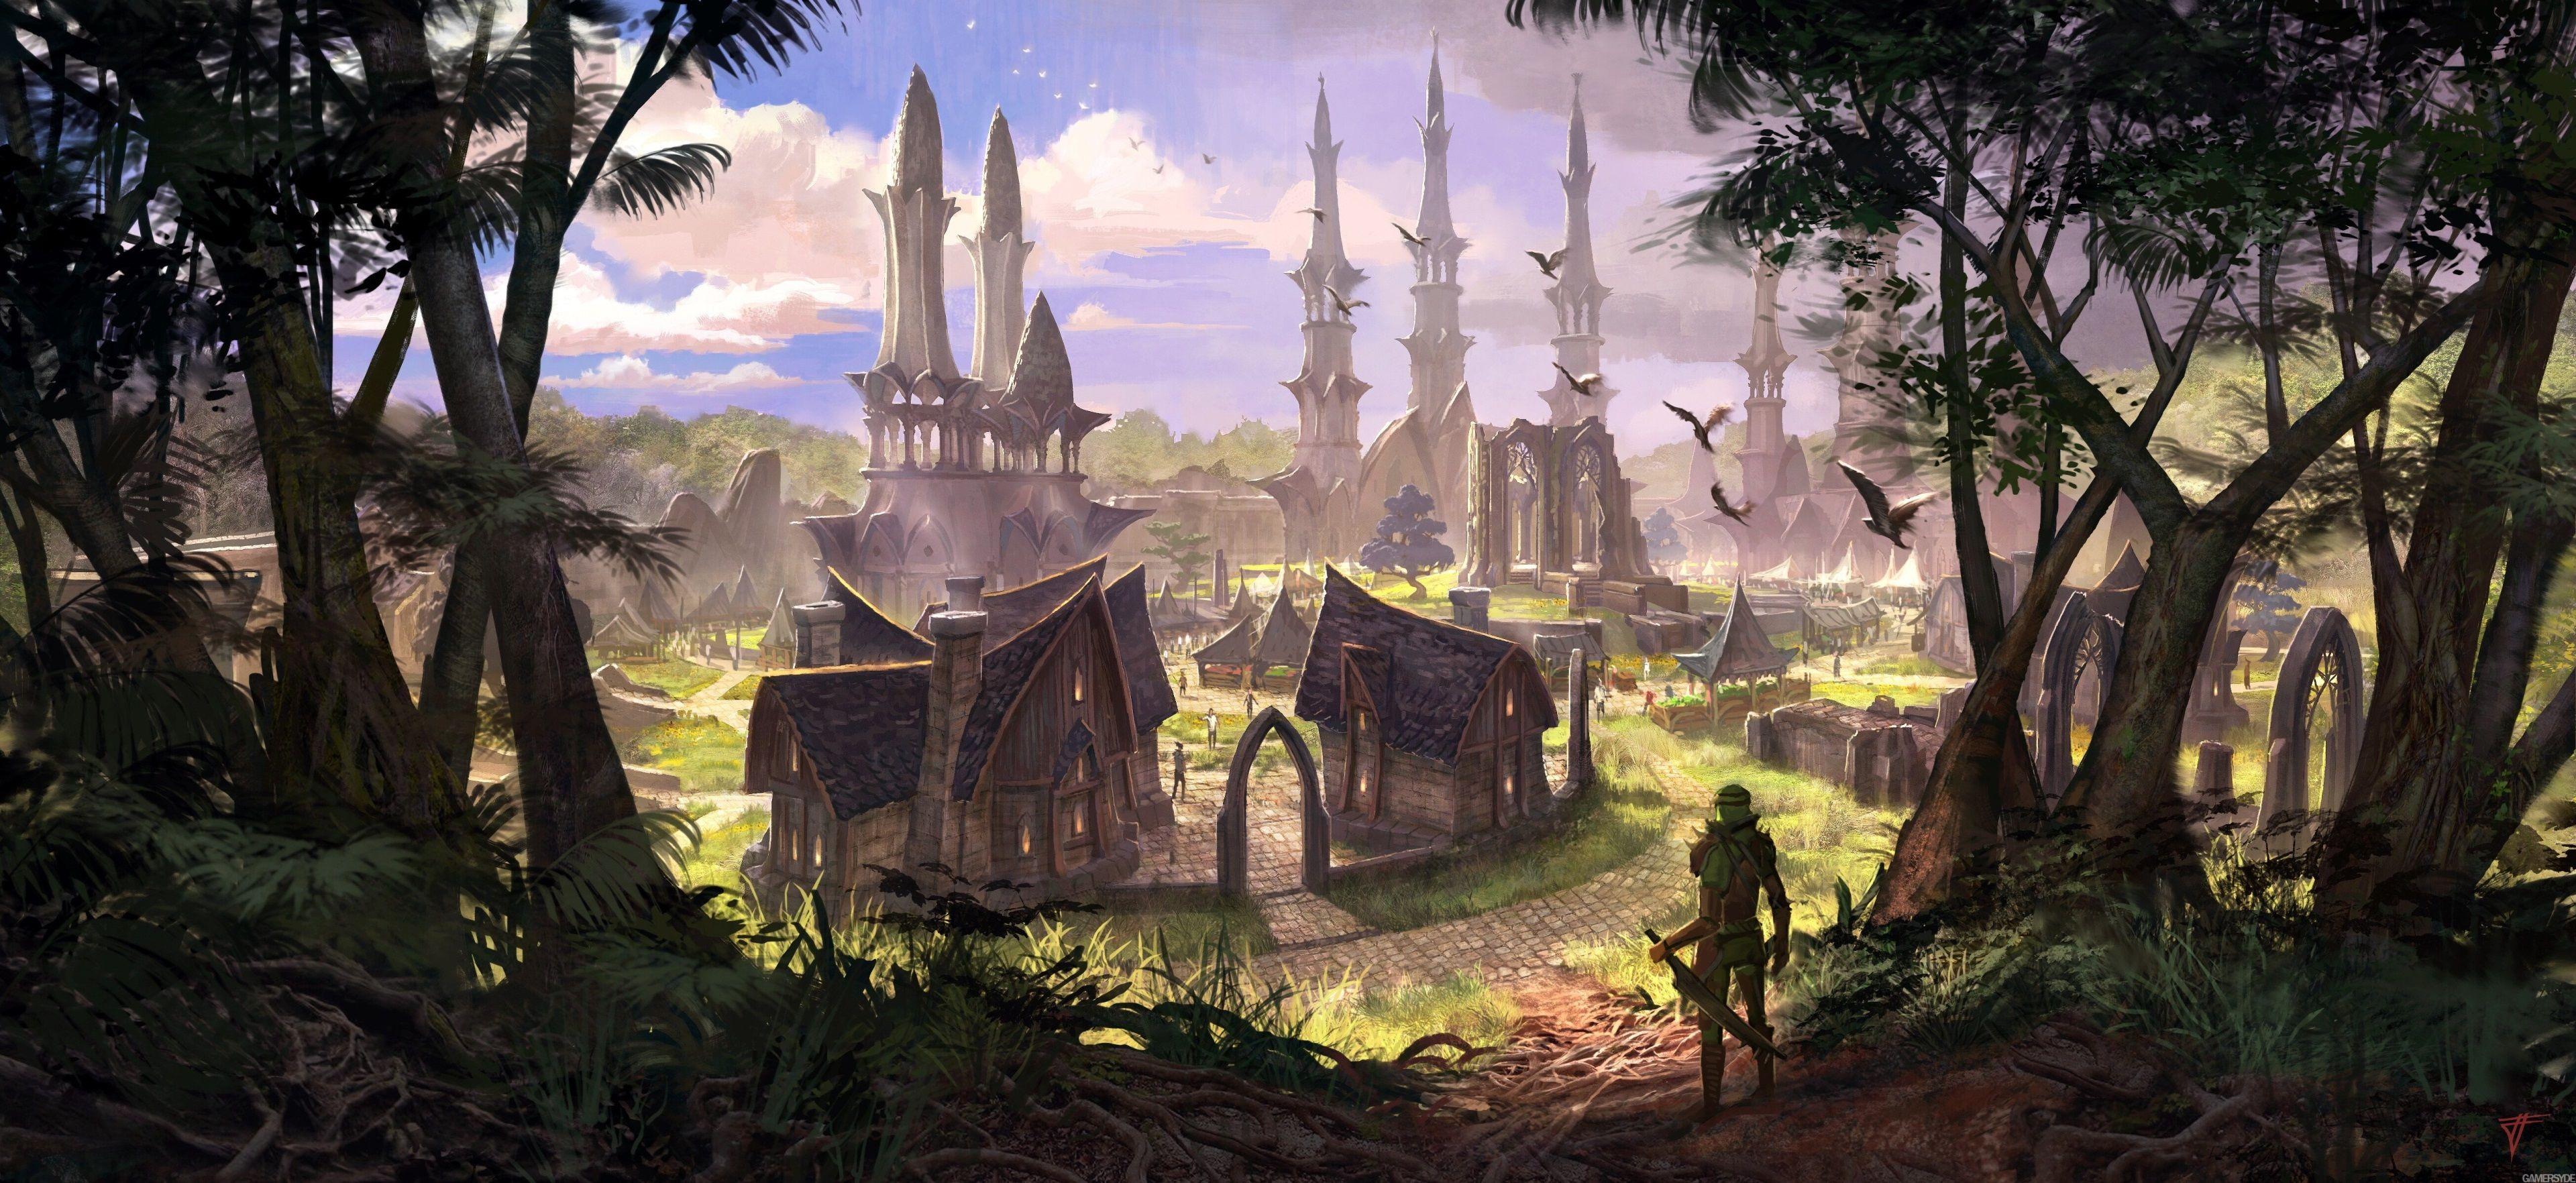 3840x1764 The Elder Scrolls Online 4k Free Downloads Hd Wallpaper Elder Scrolls Online Concept Art World Elder Scrolls